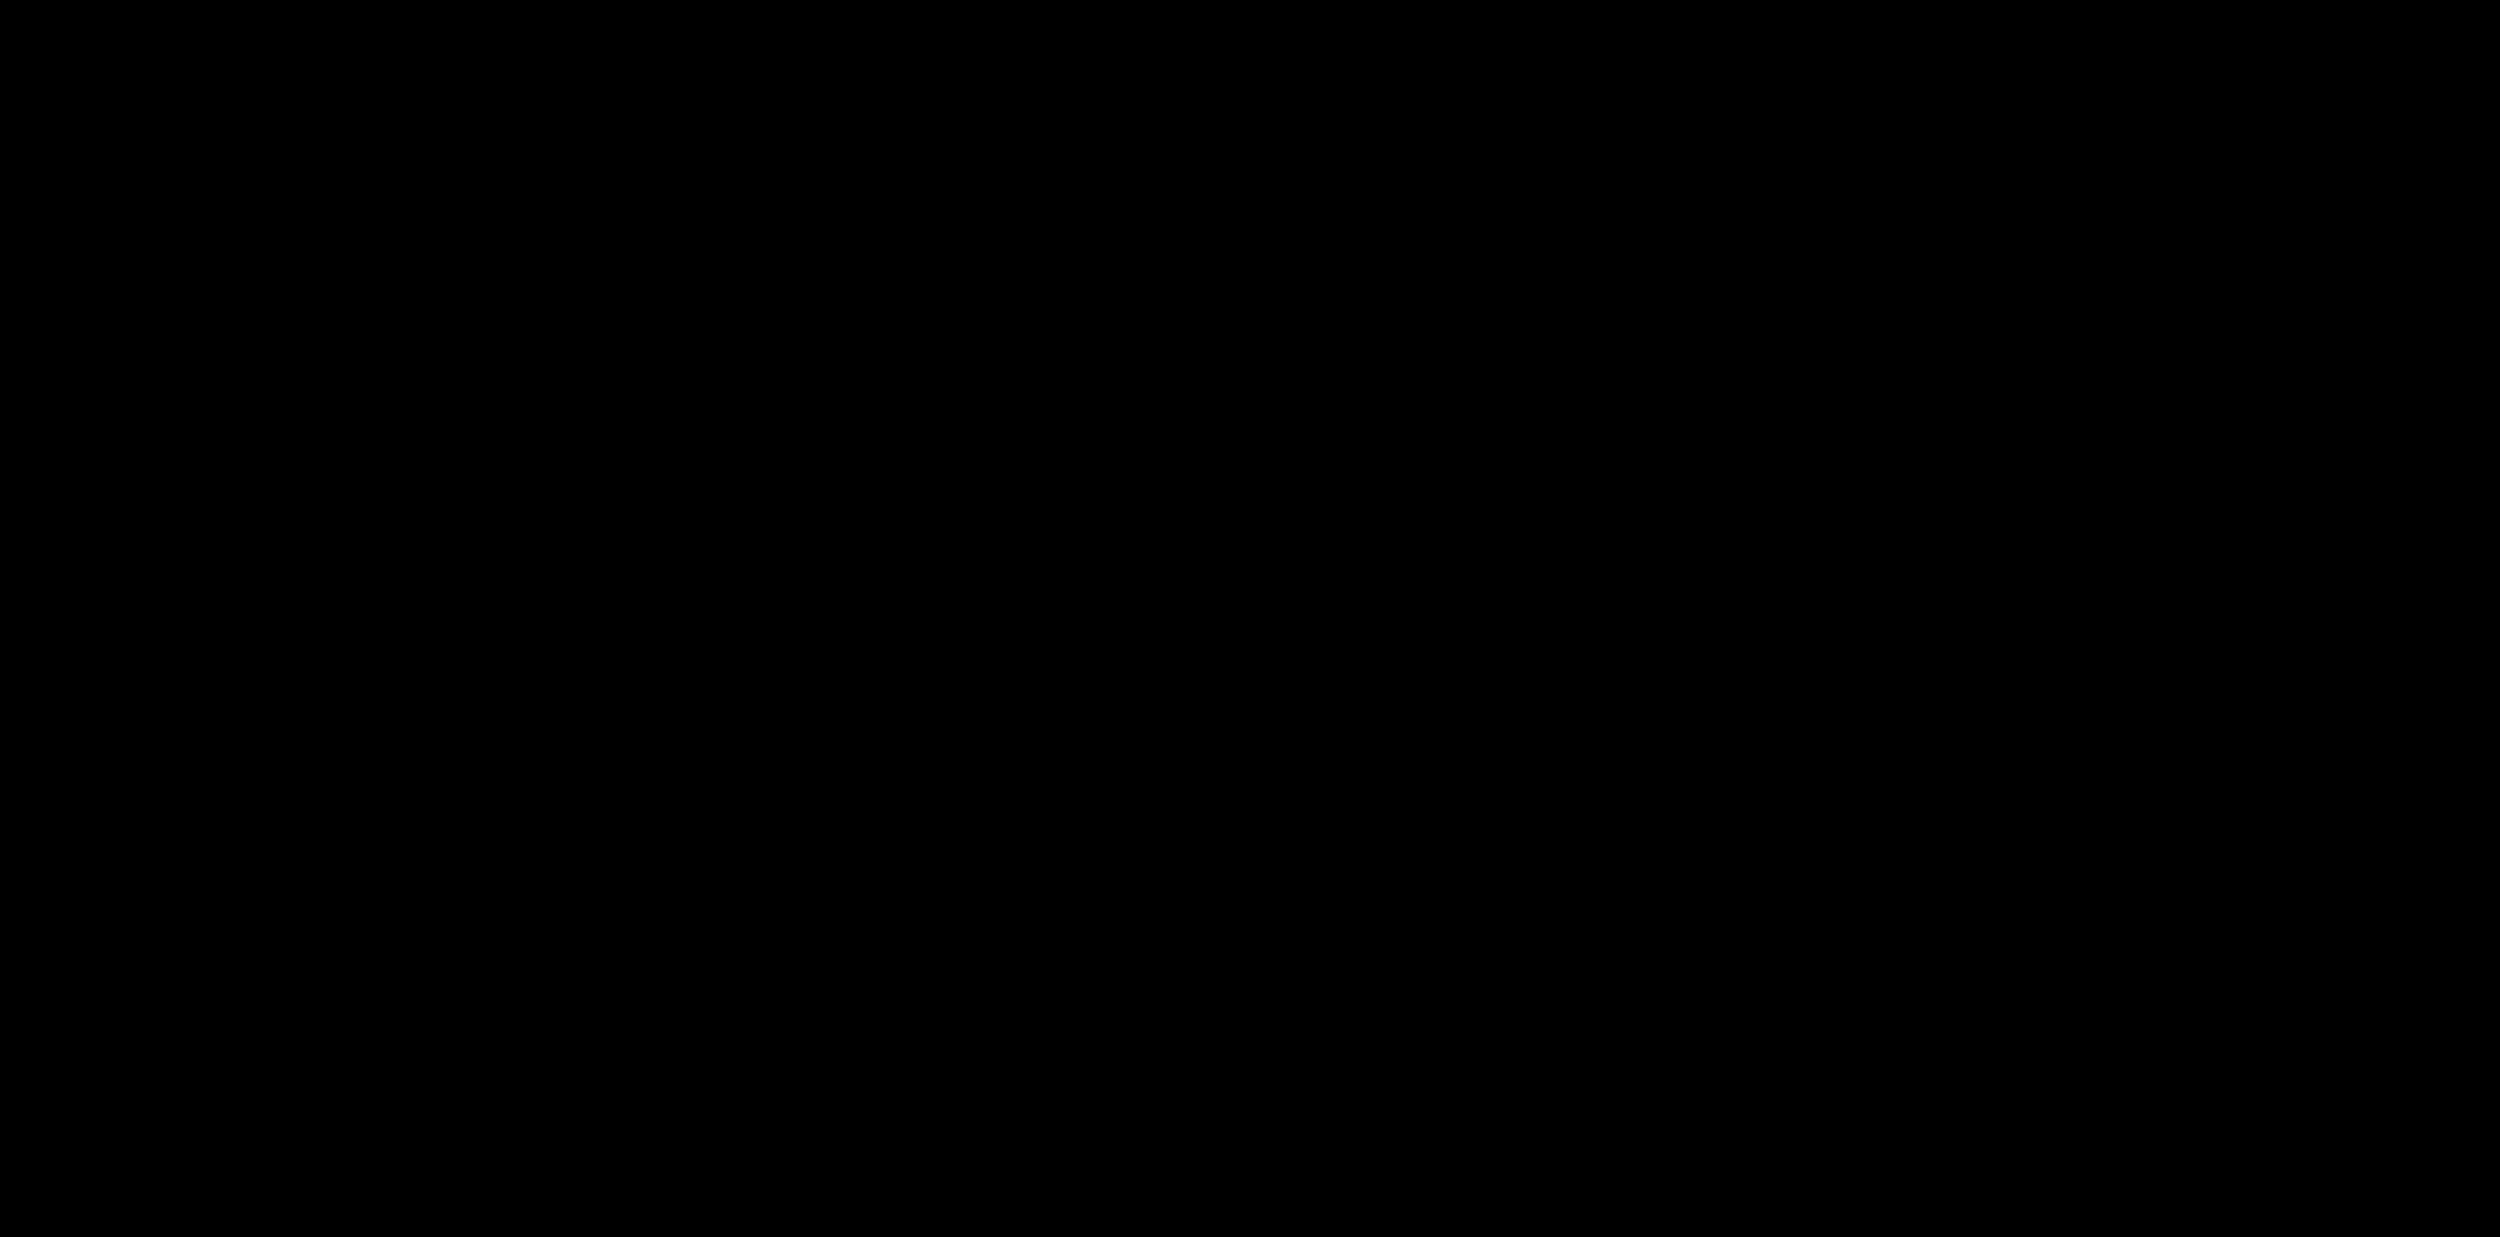 Tasqueta (1).png